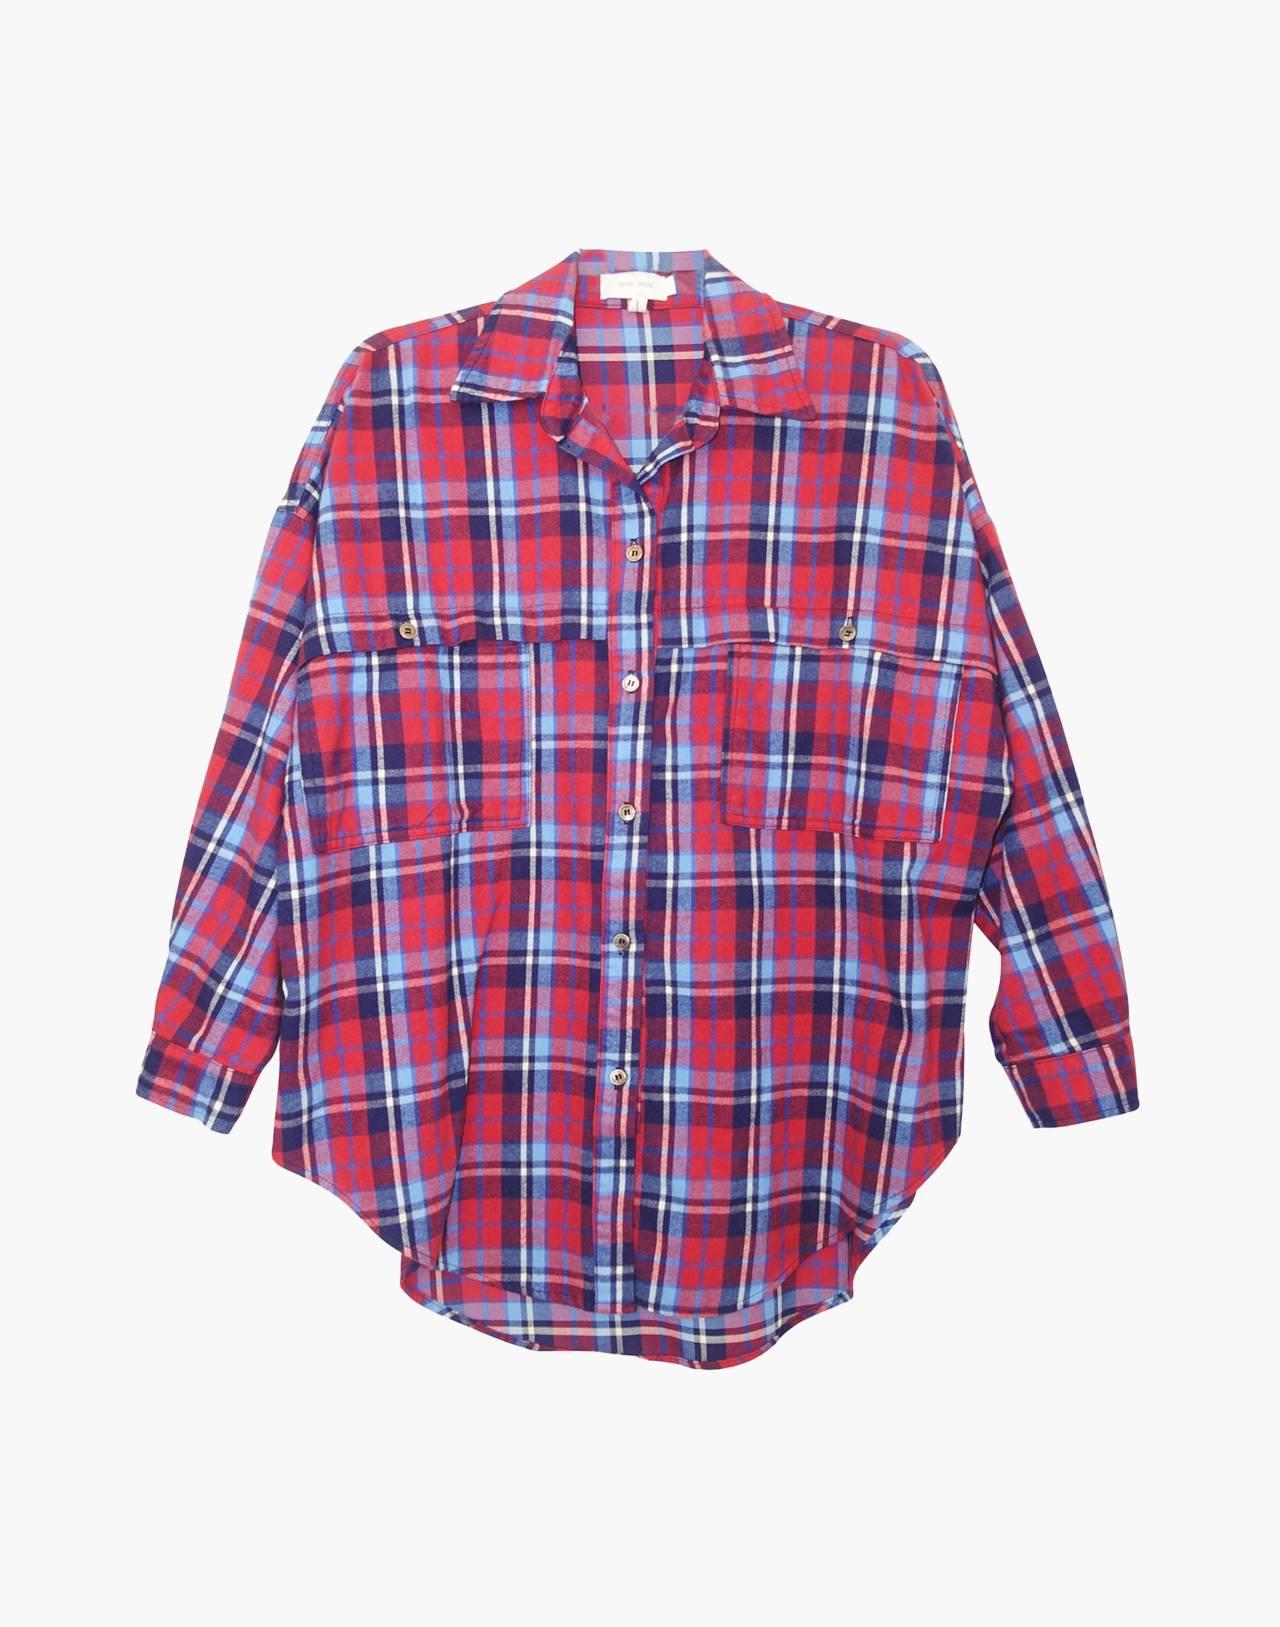 NICO NICO™ Alanis Plaid Button-Down Shirt in red multi image 1